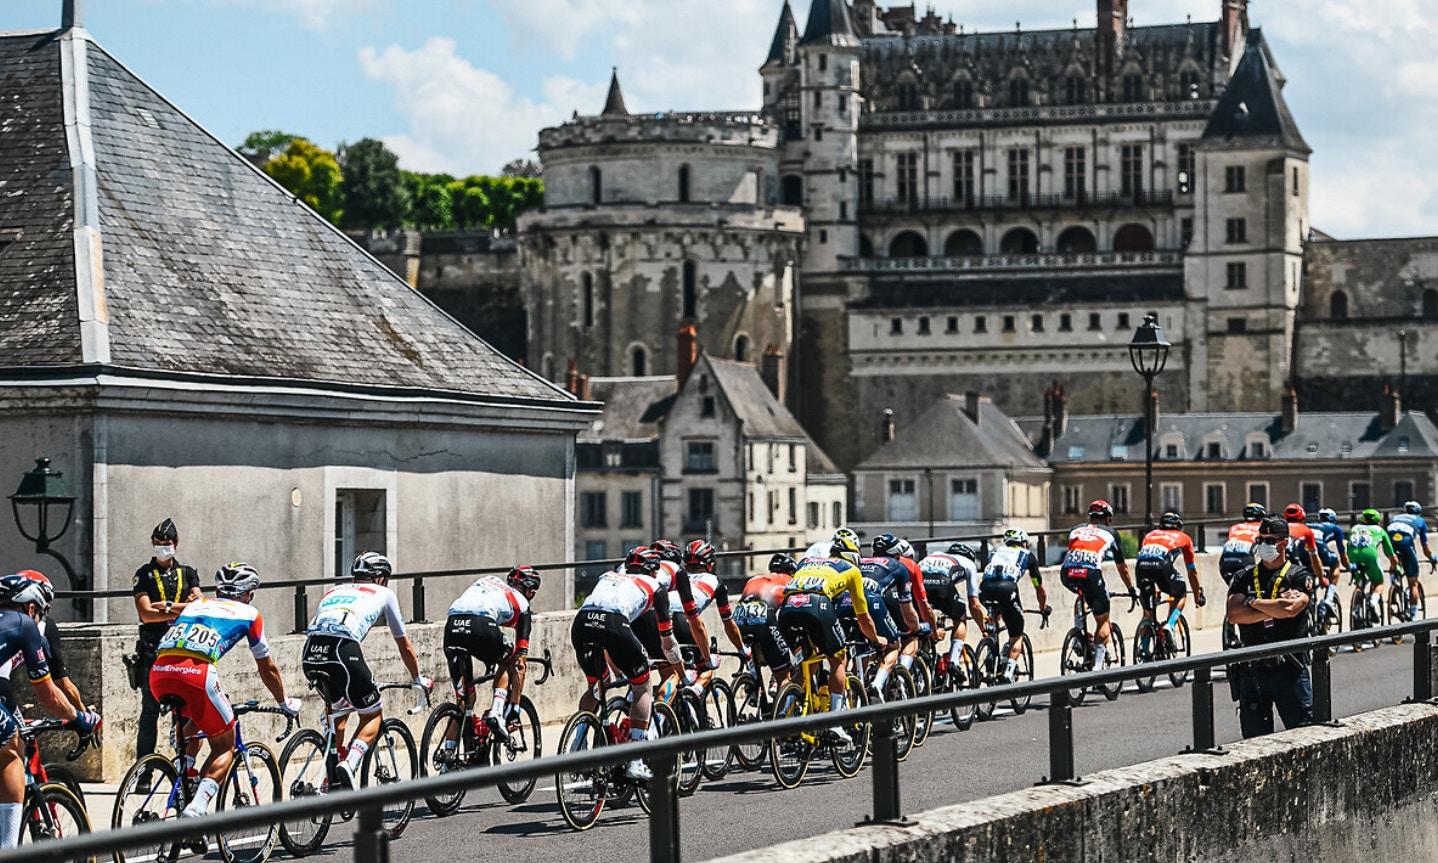 Tour de France 2021: samenvatting van de zesde etappe